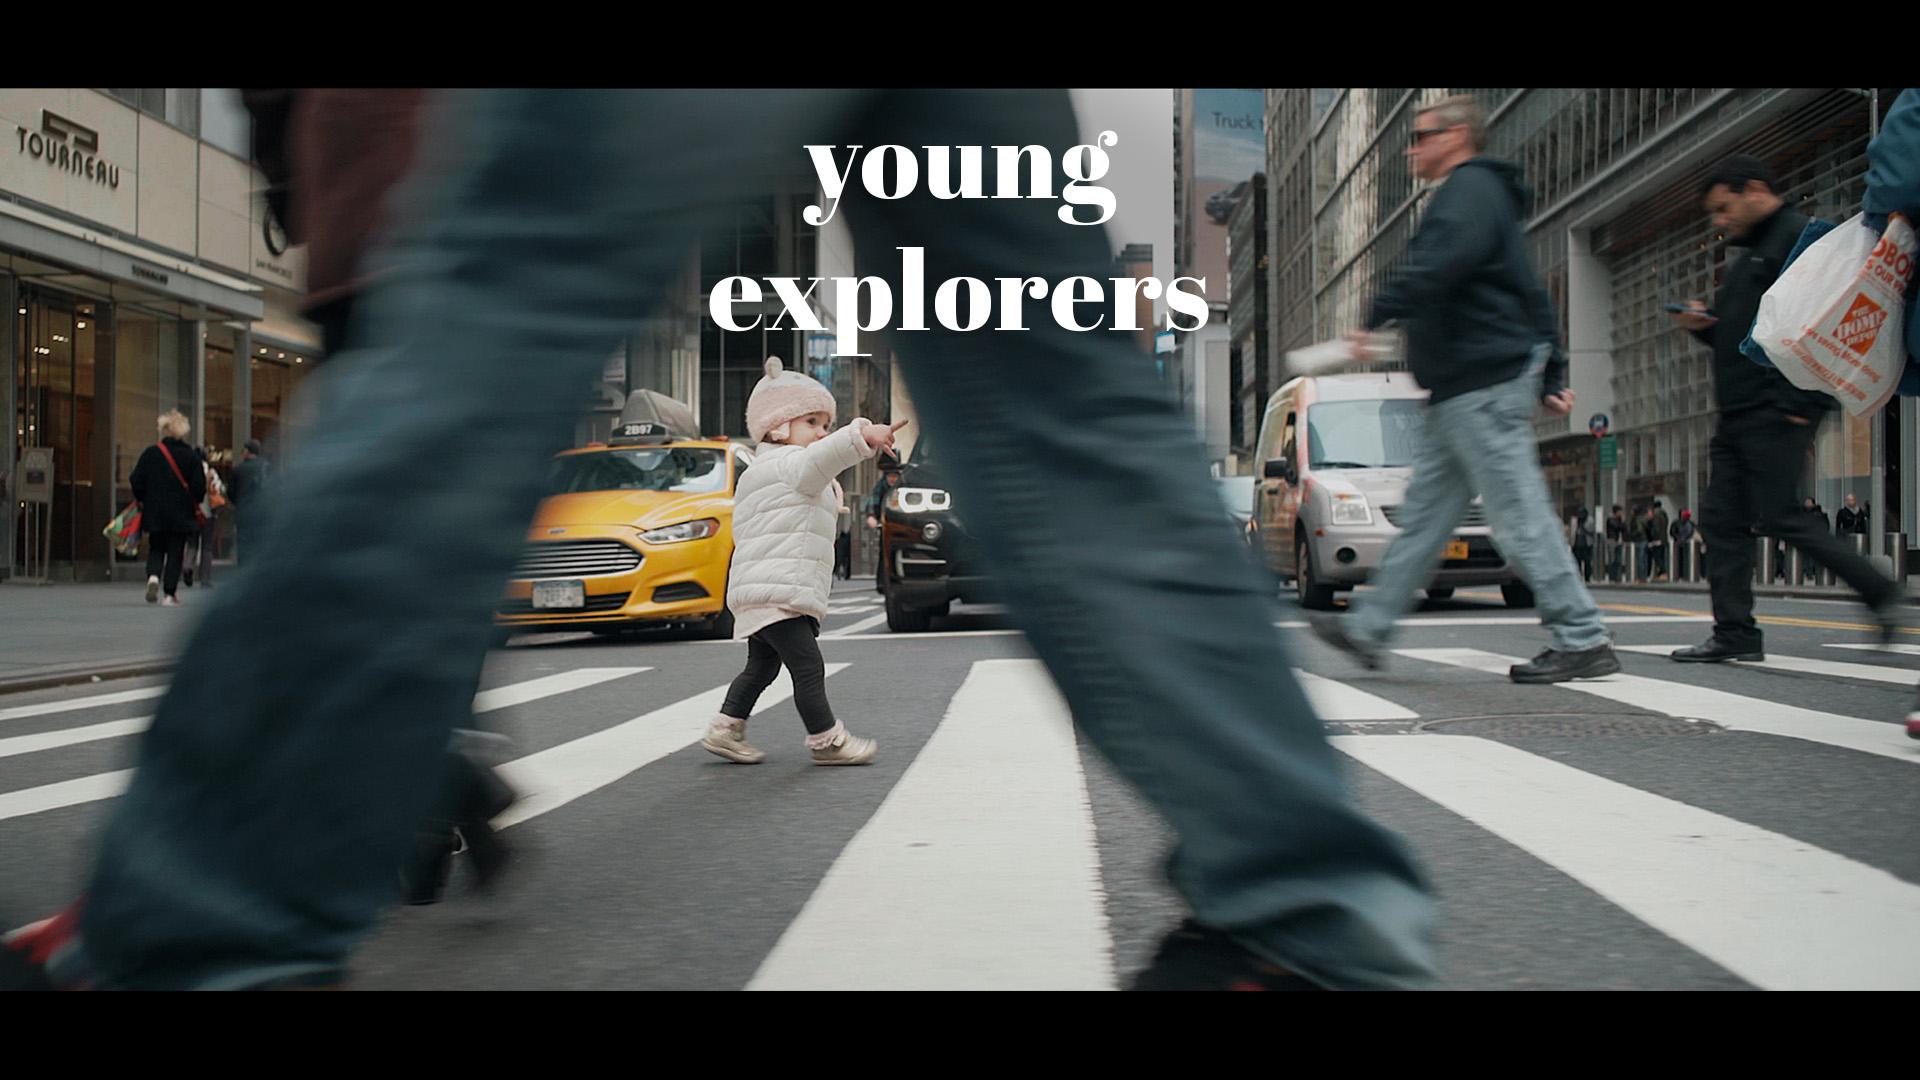 Thumb-Young Explorers_2.jpg